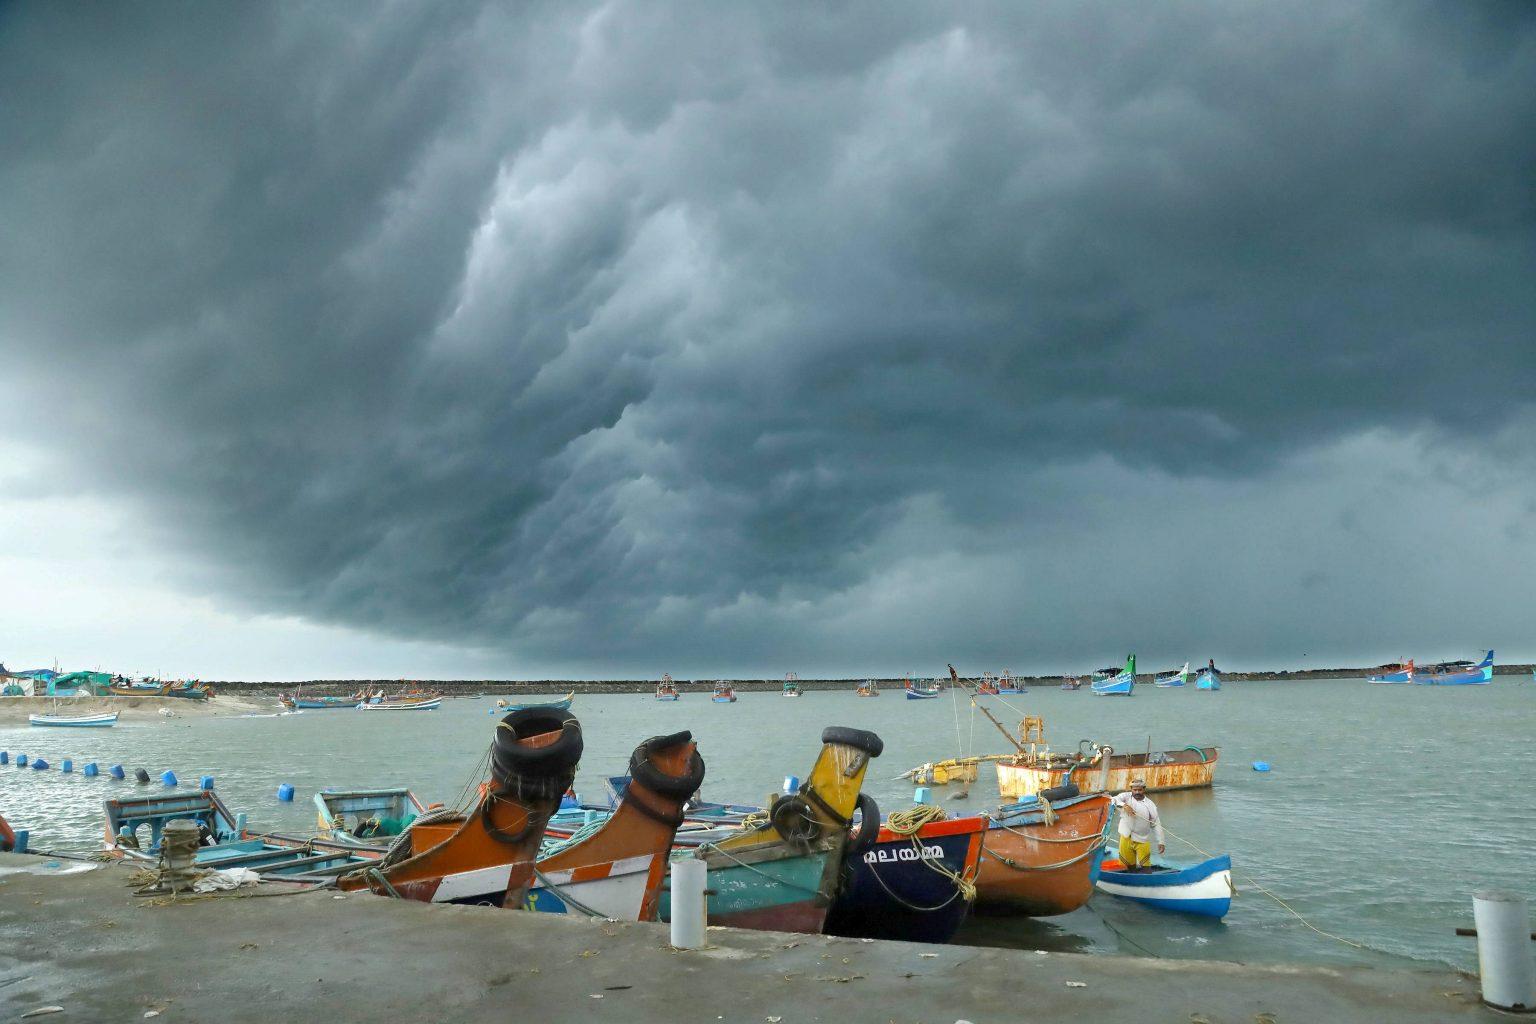 Cyclone Yaas to hit West Bengal, Odisha | పశ్చిమ బెంగాల్, ఒడిశాను తాకనున్న యాస్ తుఫాను |_40.1